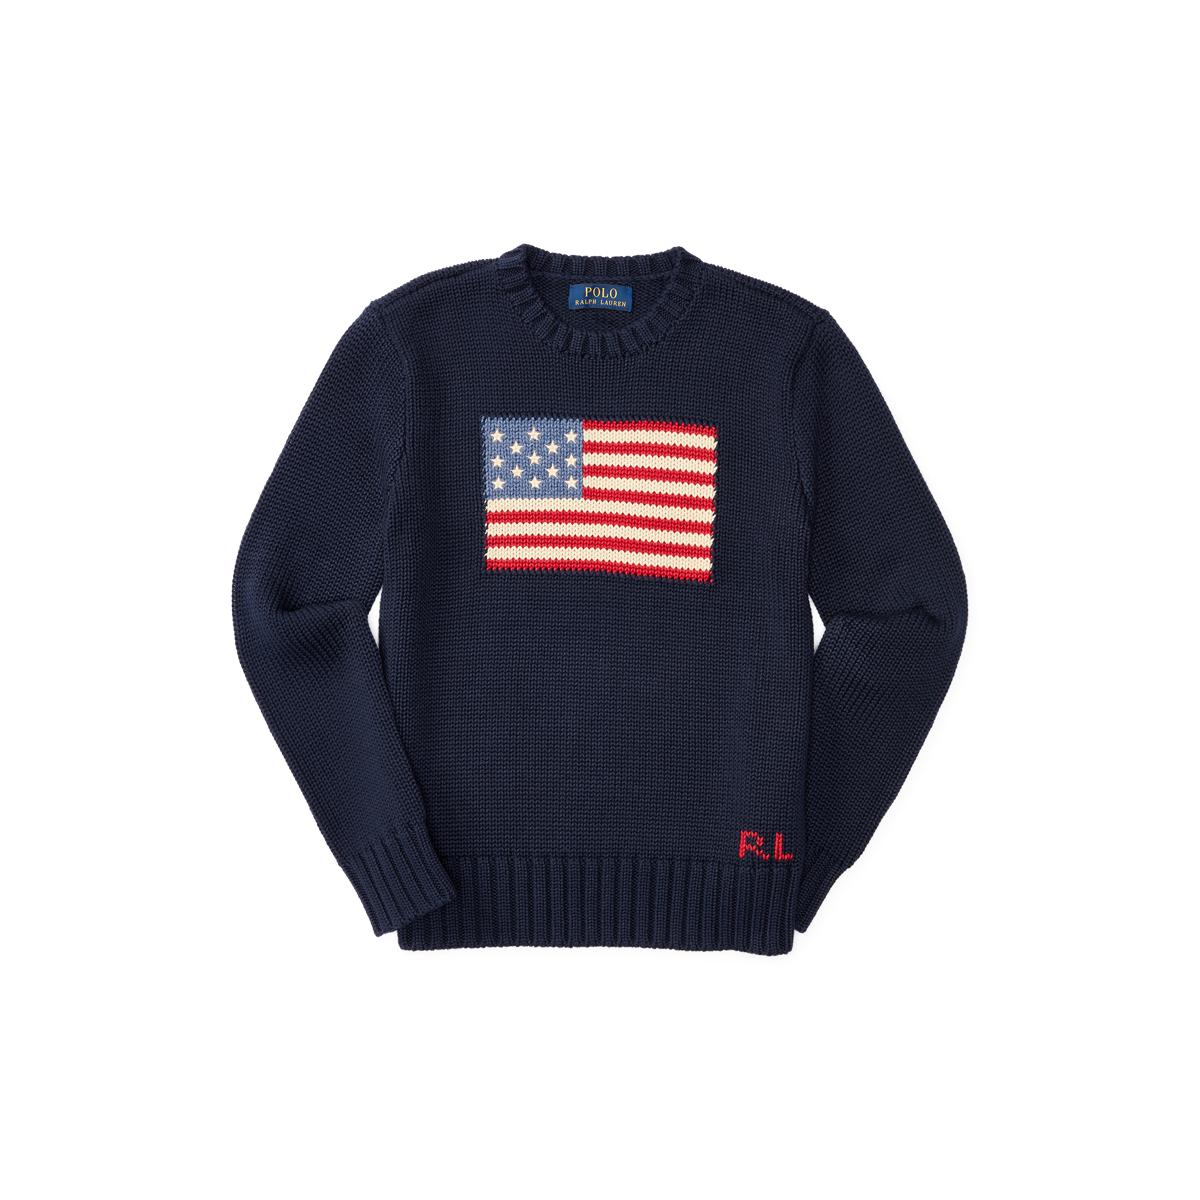 a457504ac Flag Cotton Crewneck Sweater